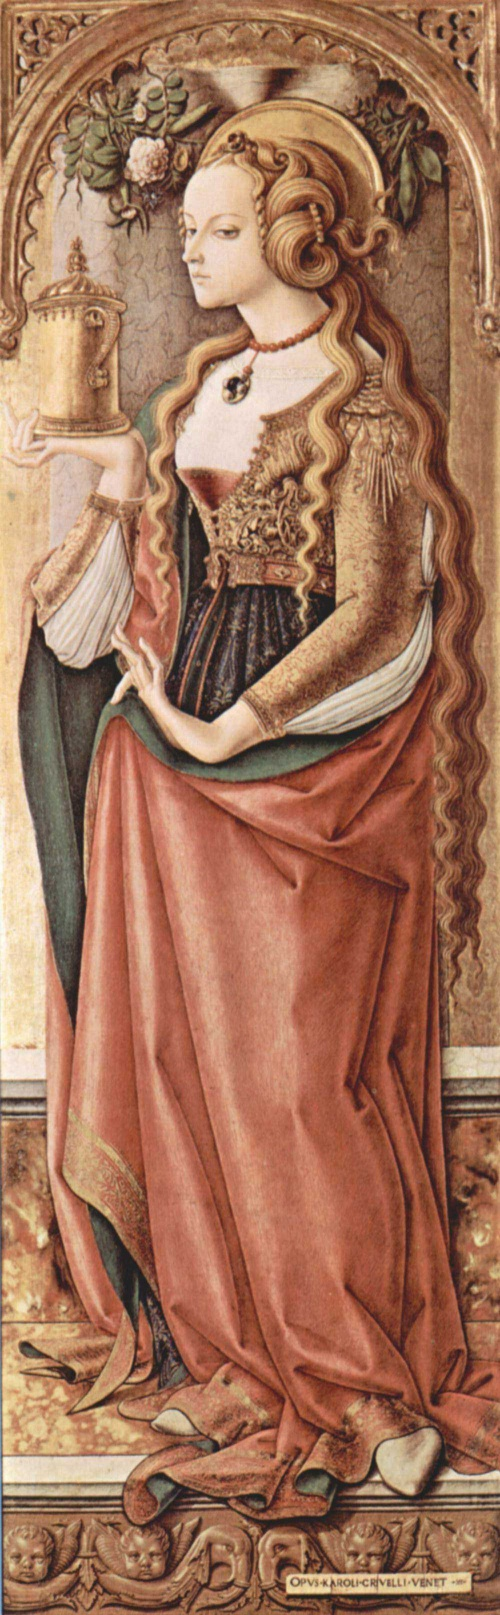 Artworks of Carlo Crivelli (180 работ)